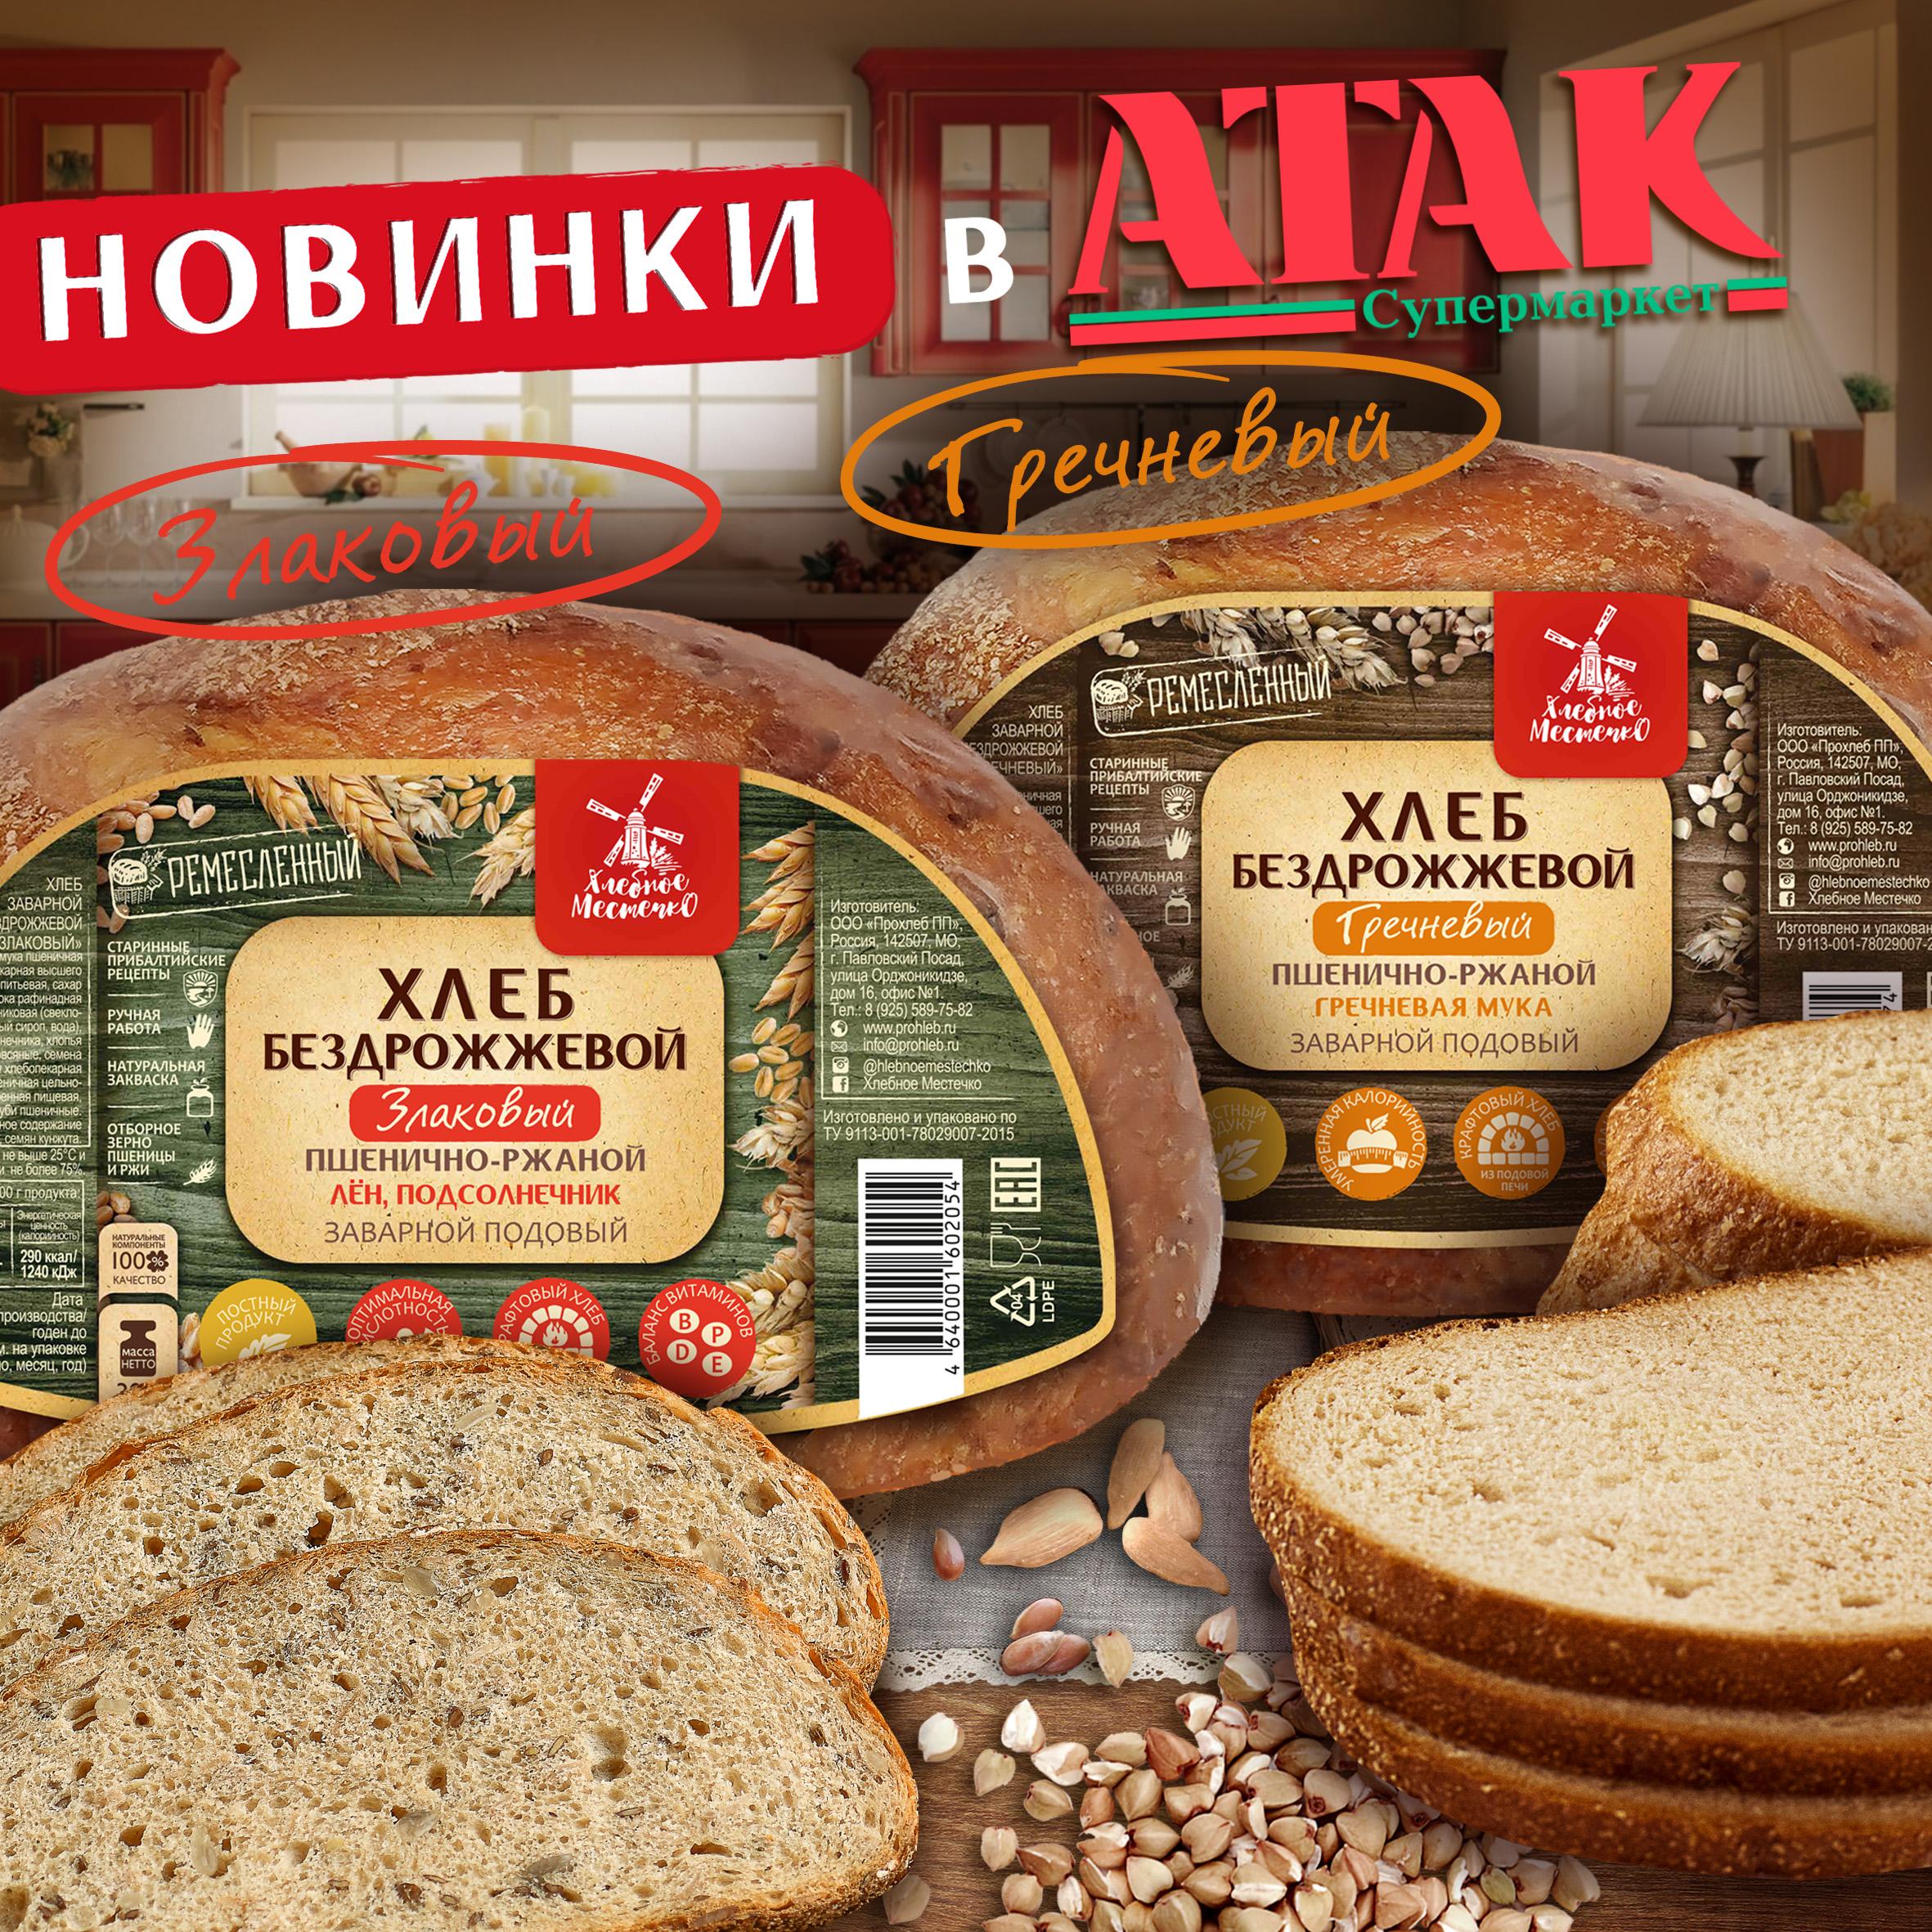 Хлеб «Гречневый»Хлеб «Злаковый»Атак